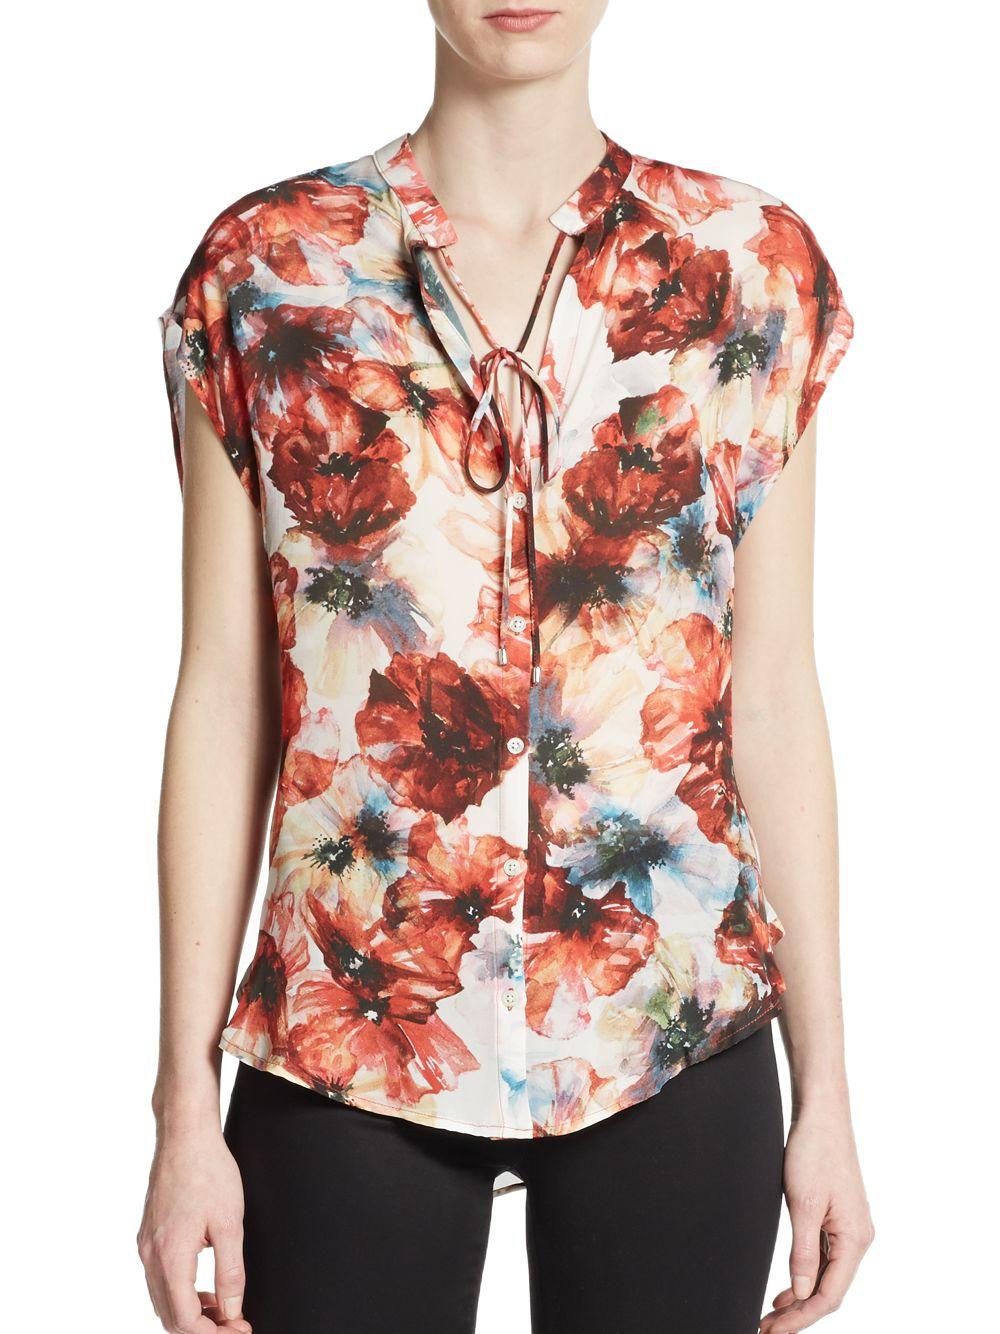 Haute Hippie Floral Silk Blouse Chiffon Blouse Pink